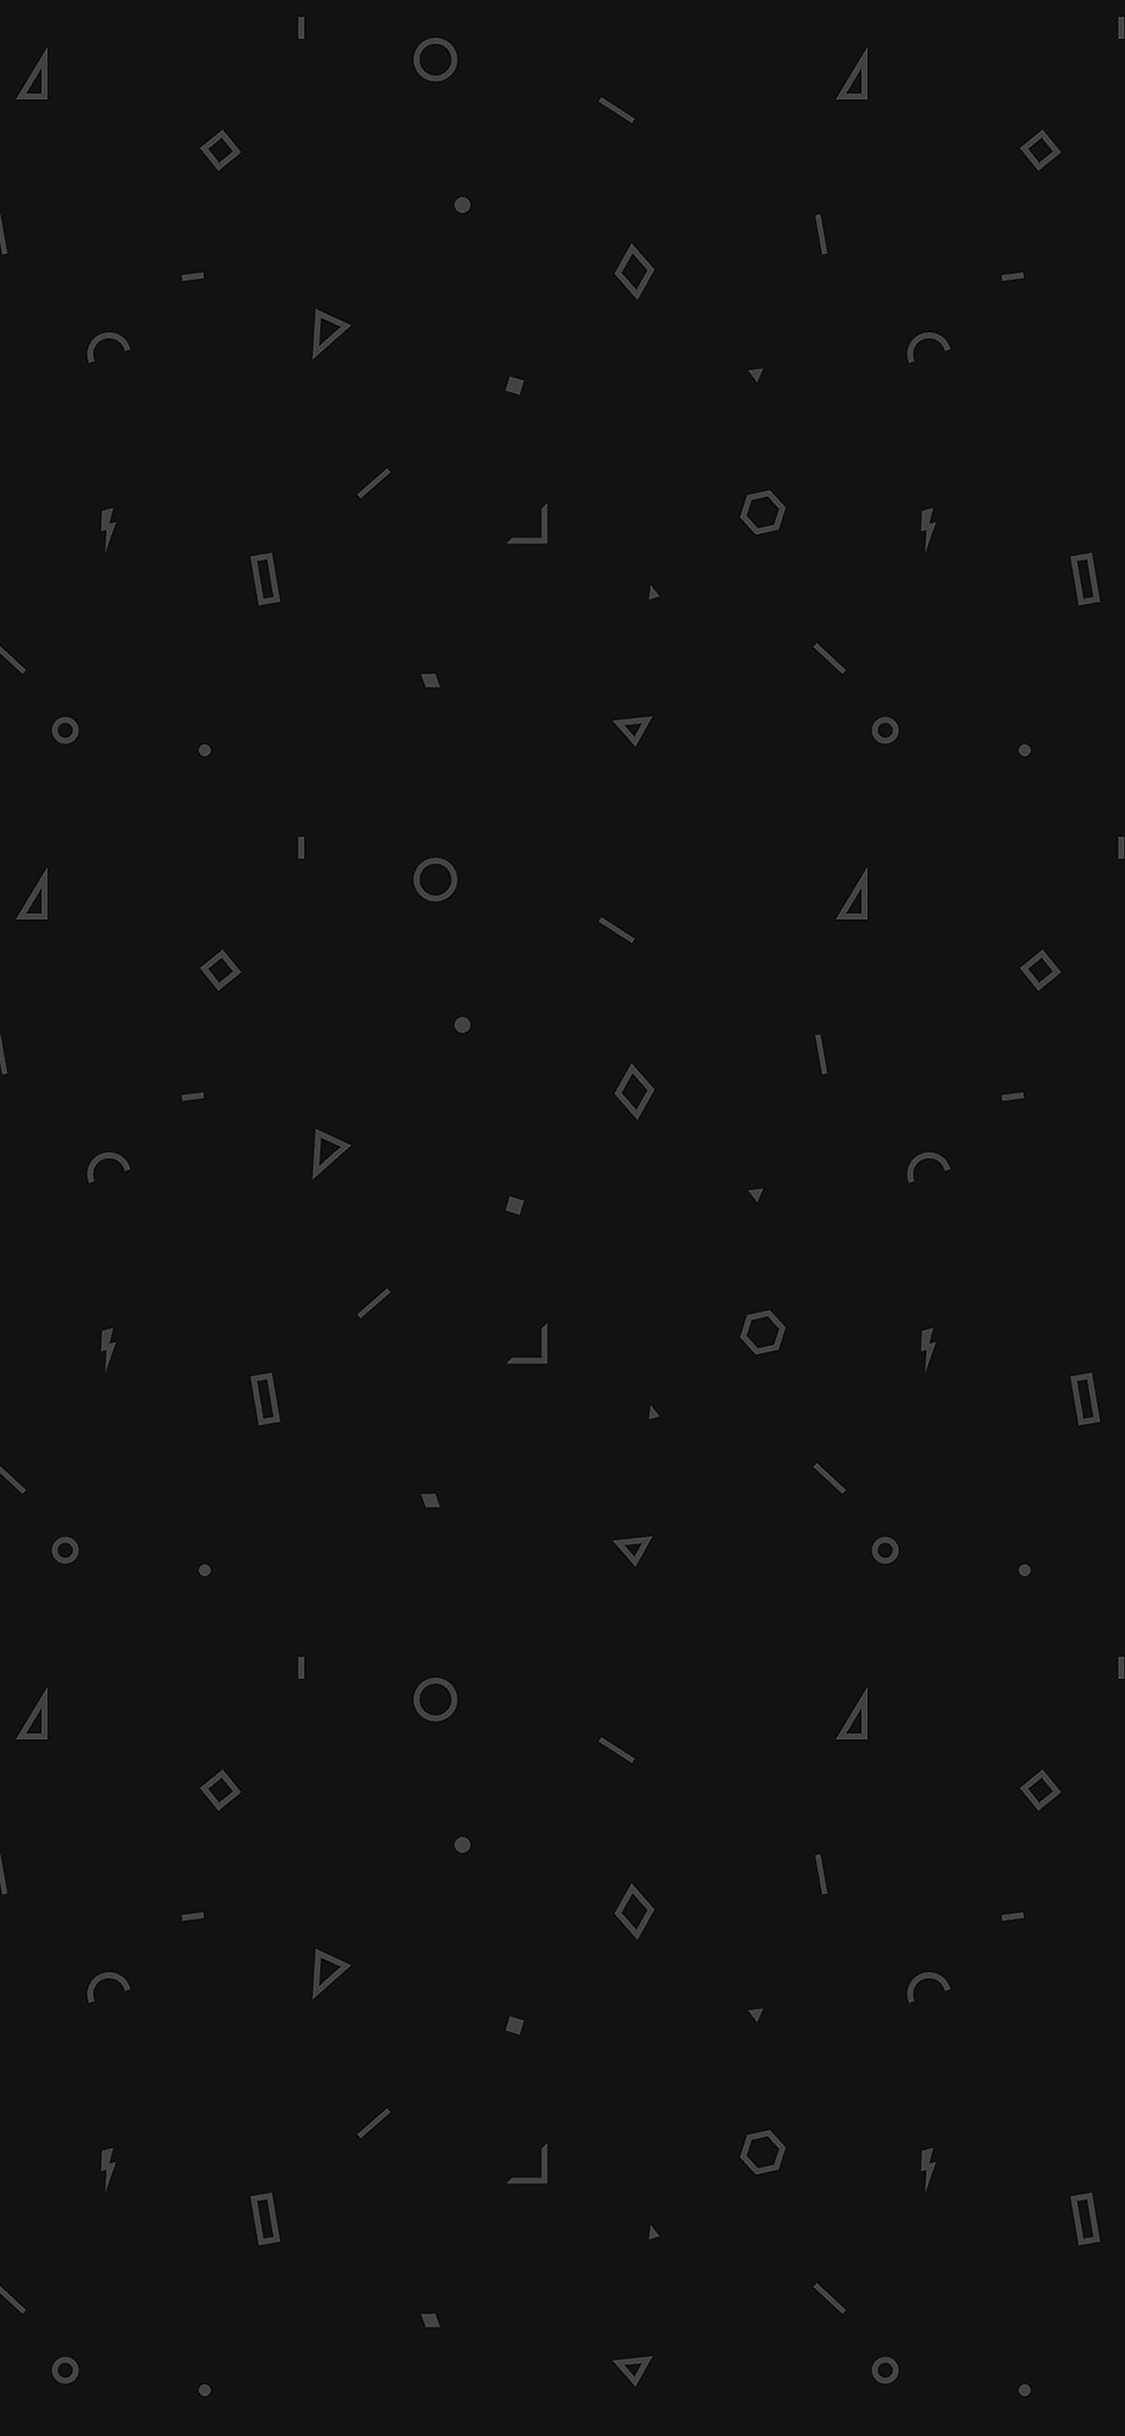 iPhoneXpapers.com-Apple-iPhone-wallpaper-vb40-wallpaper-geometry-black-pattern